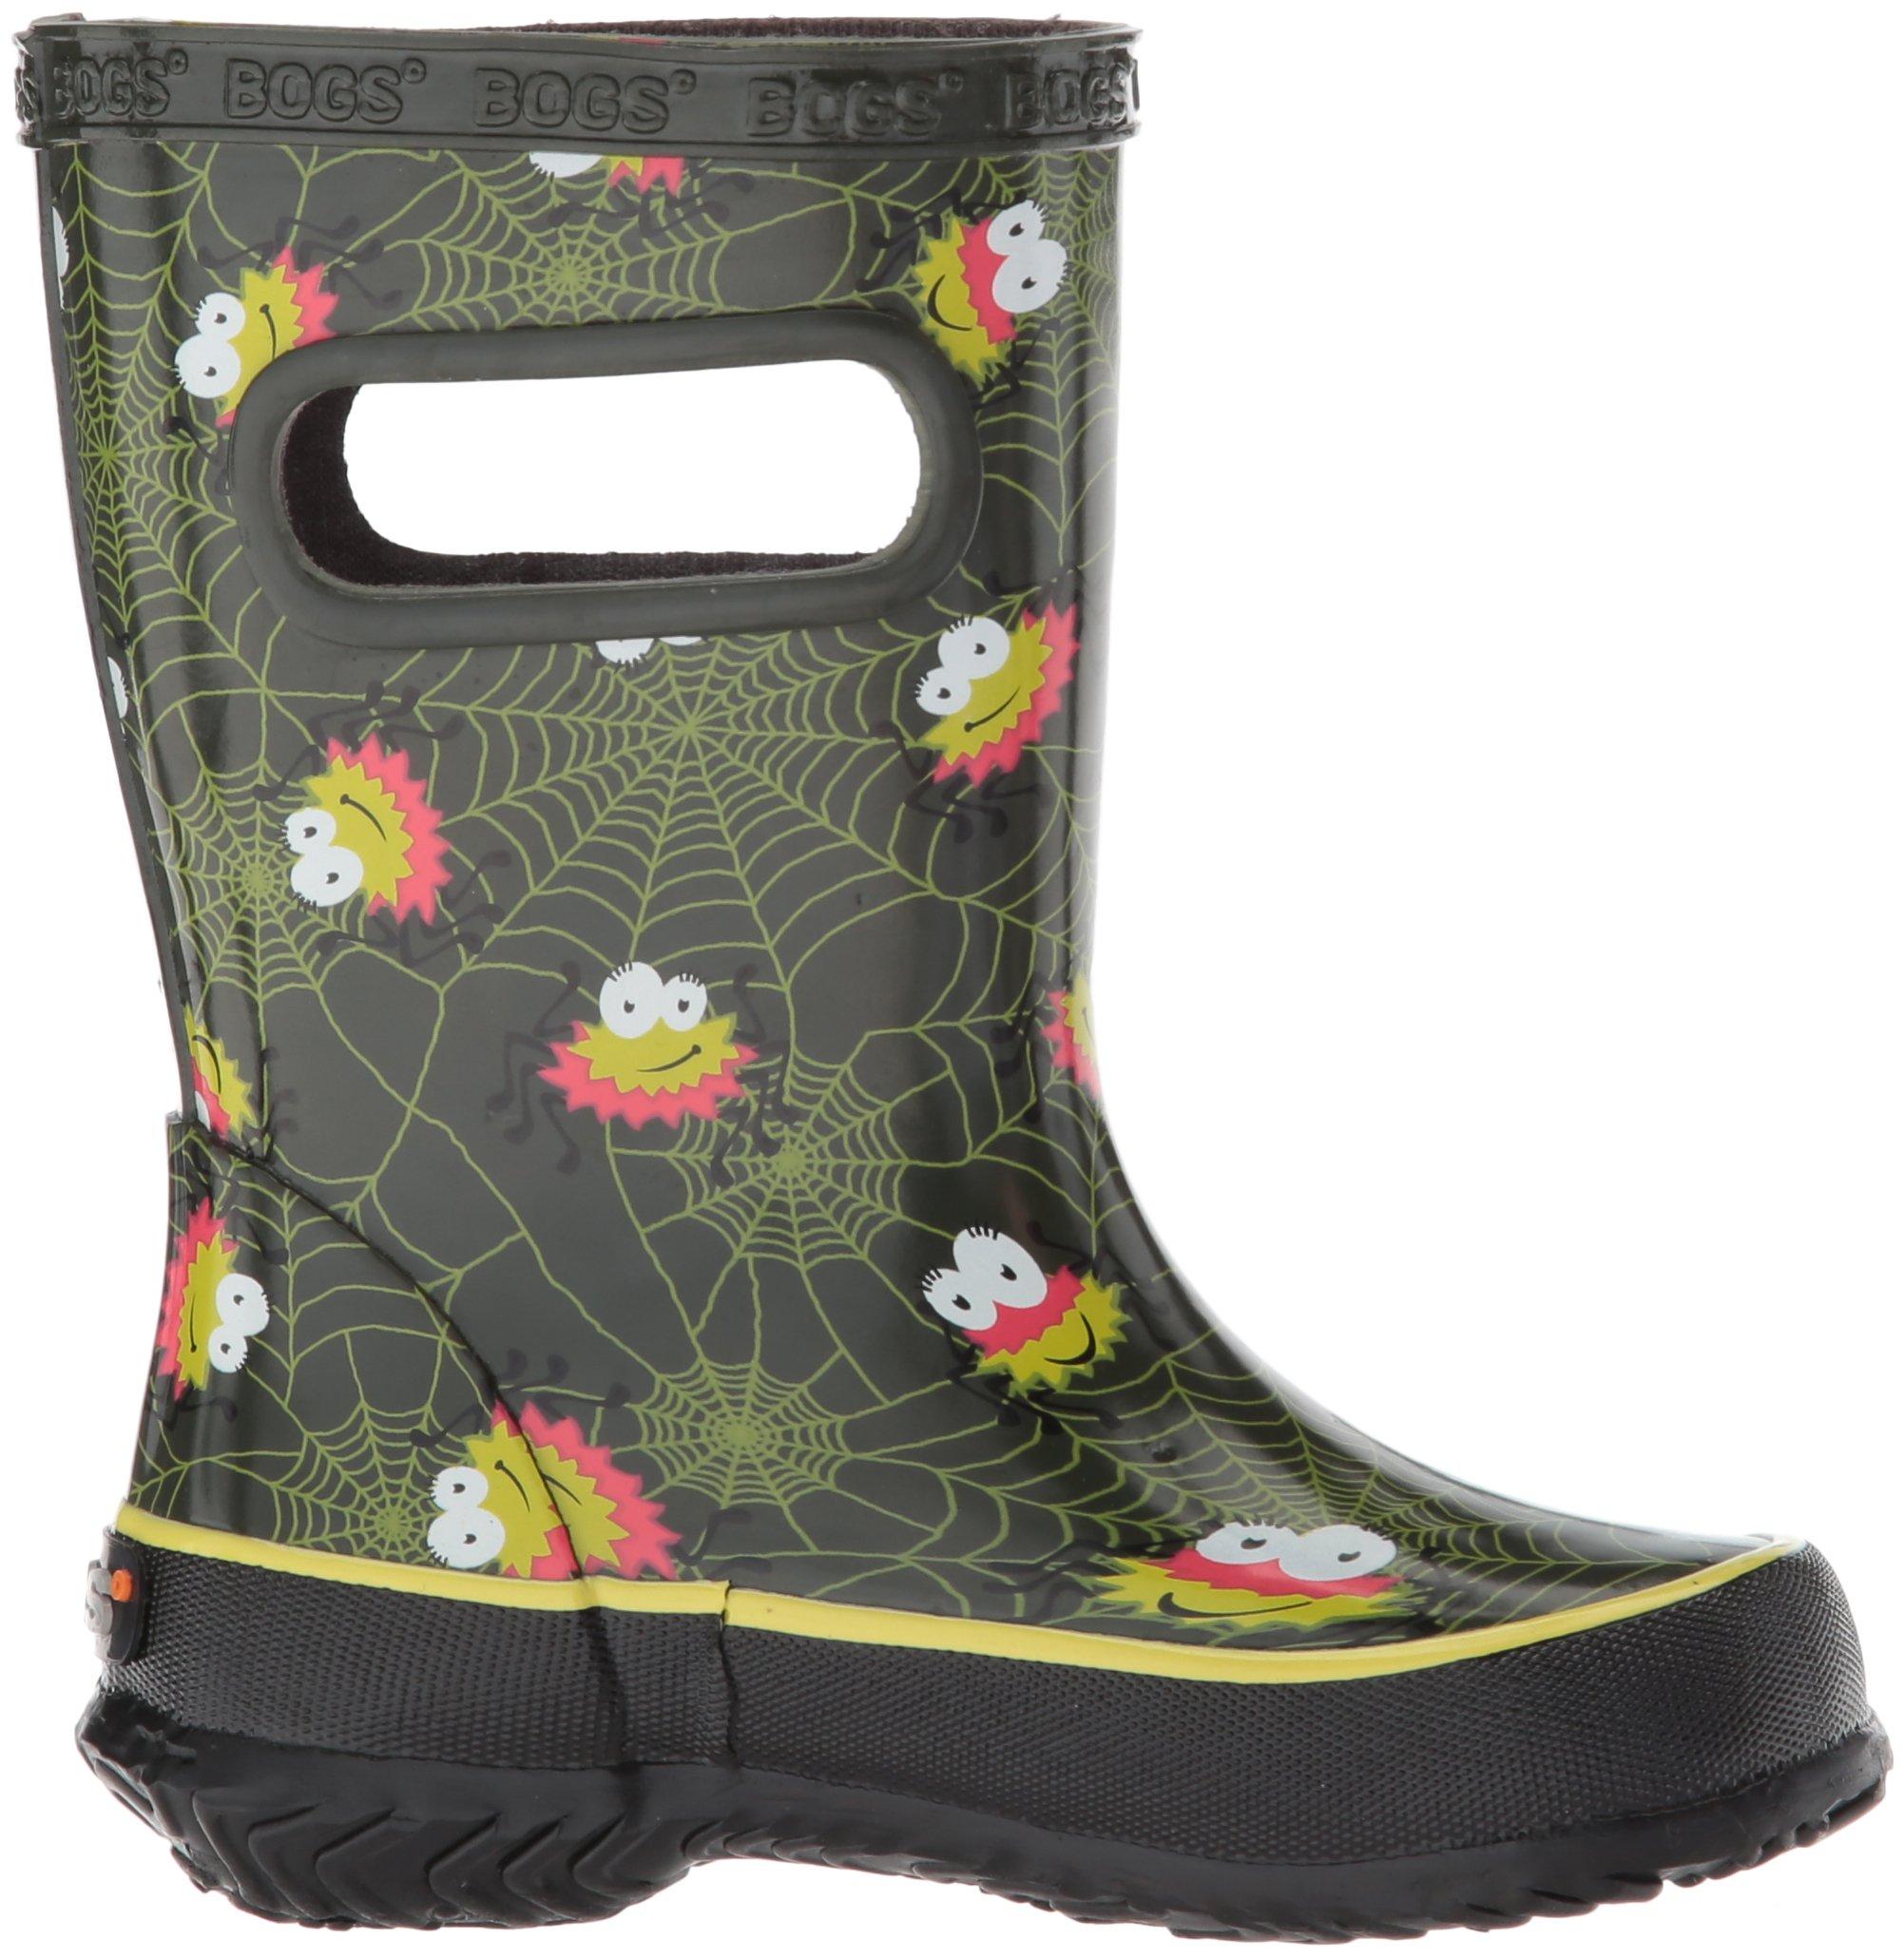 Bogs Kids' Skipper Waterproof Rubber Rain Boot for Boys and Girls,Smiley Spiders/Dark Green/Multi,11 M US Little Kid by Bogs (Image #7)